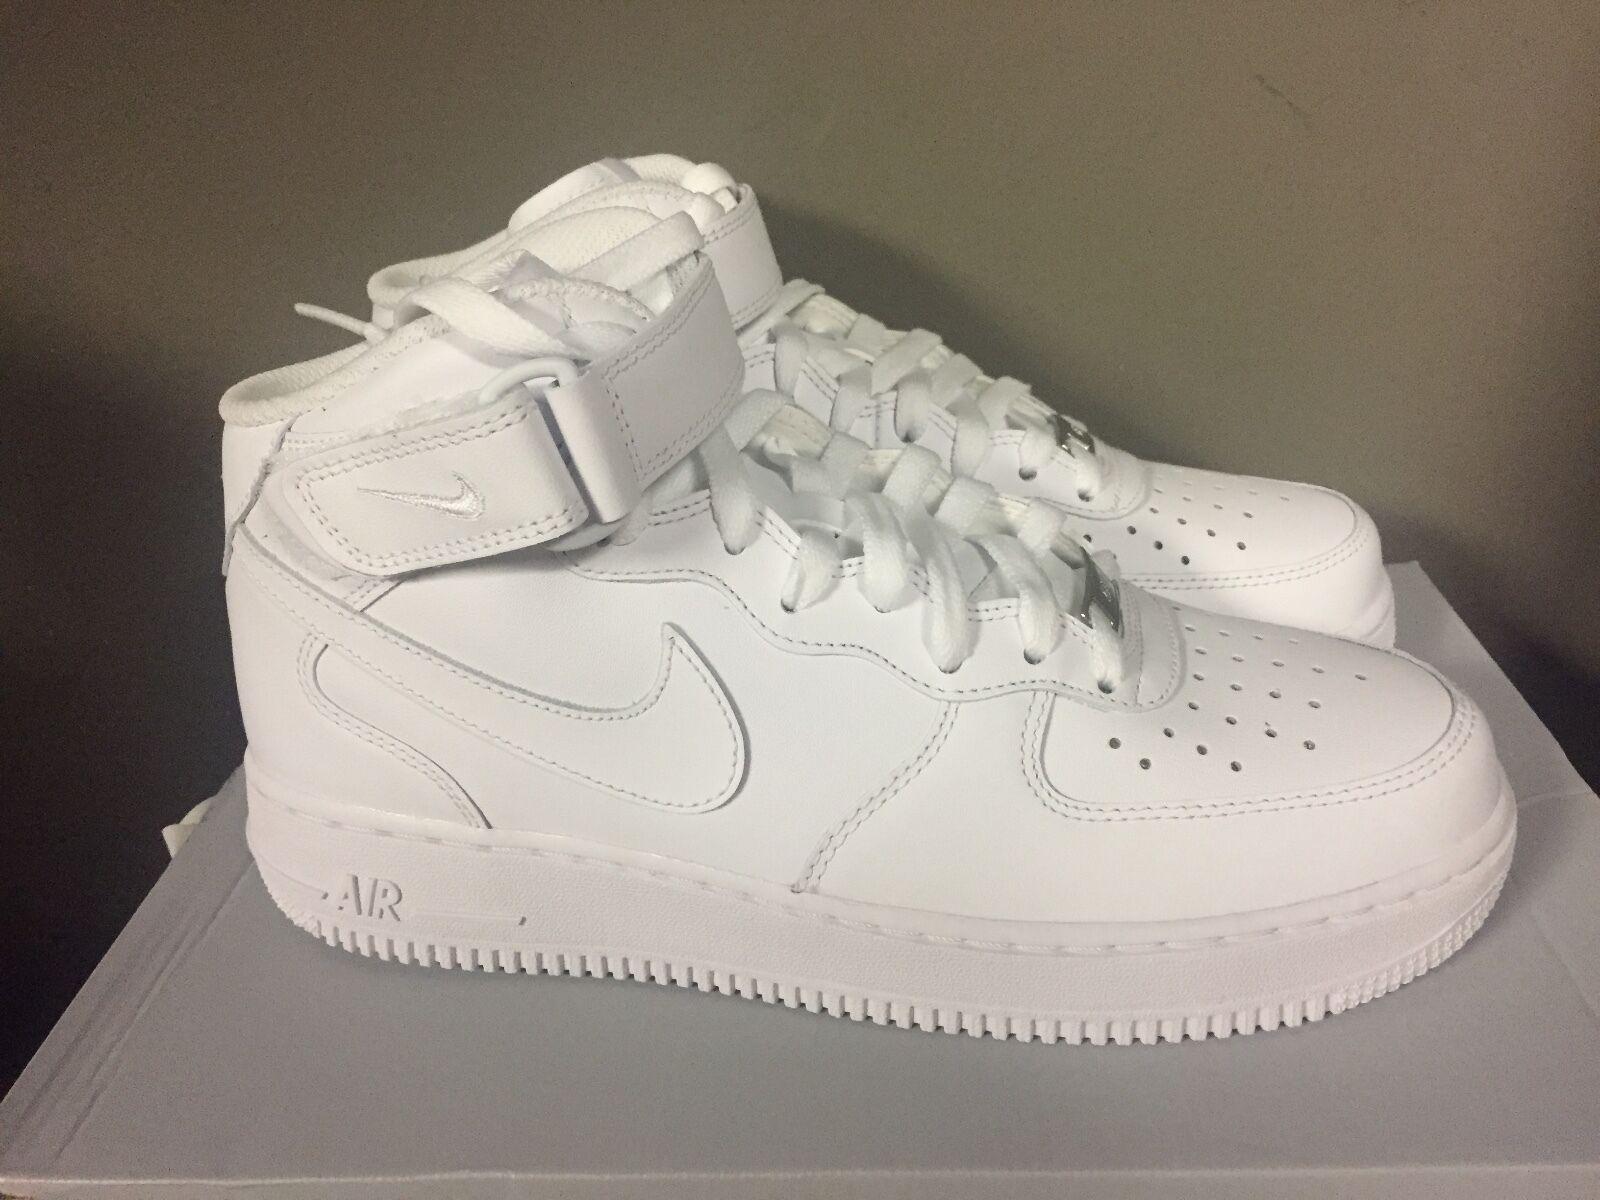 Nike air force 1 met 2007 scarpe scarpe scarpe da uomo bianco / bianco 315123-111 00bca4